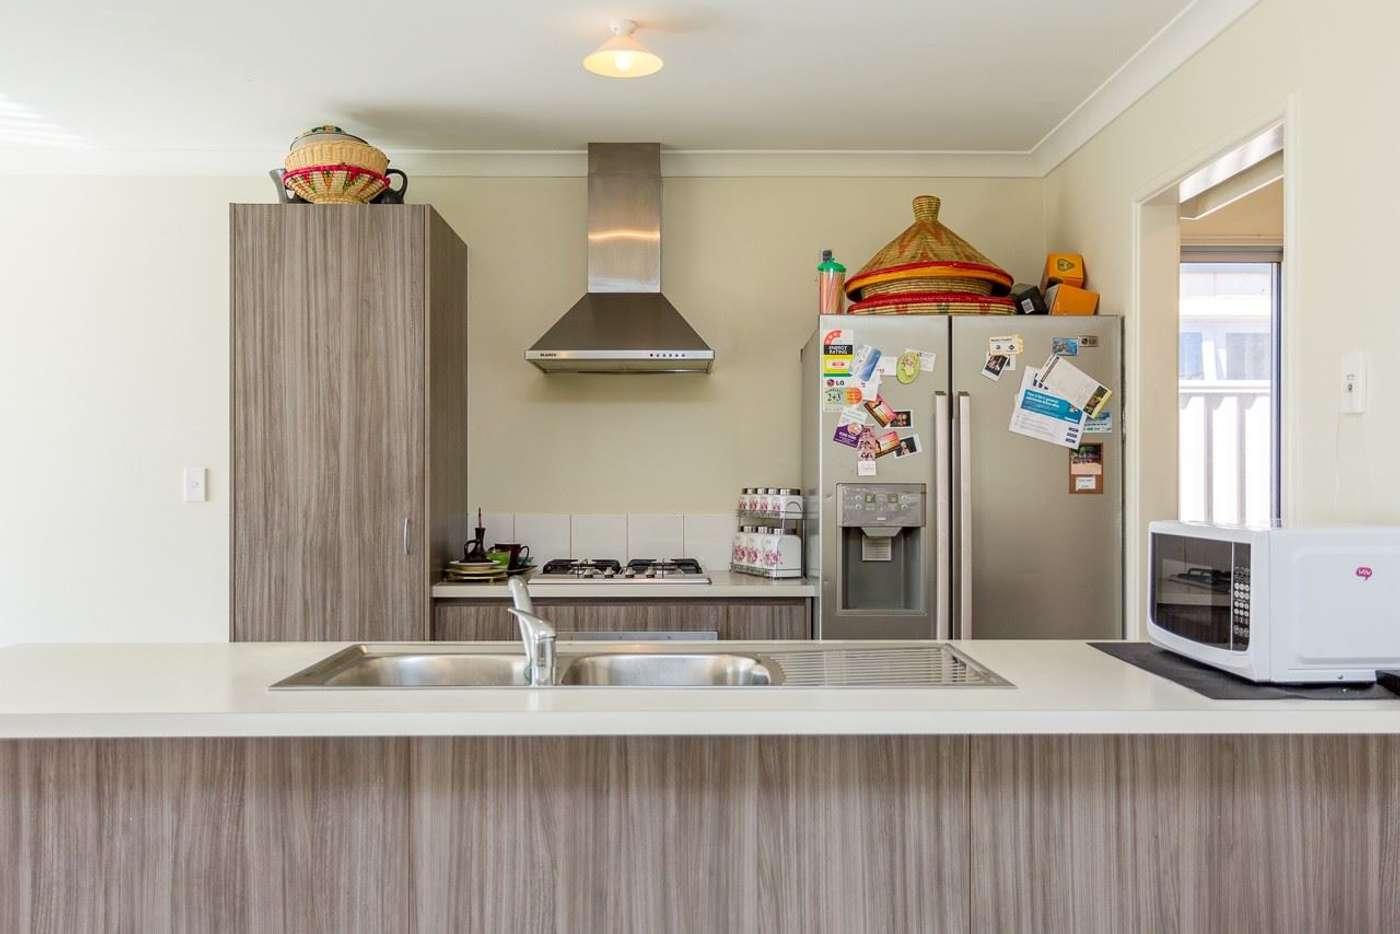 Seventh view of Homely house listing, 36 Panozza Circle, Maddington WA 6109